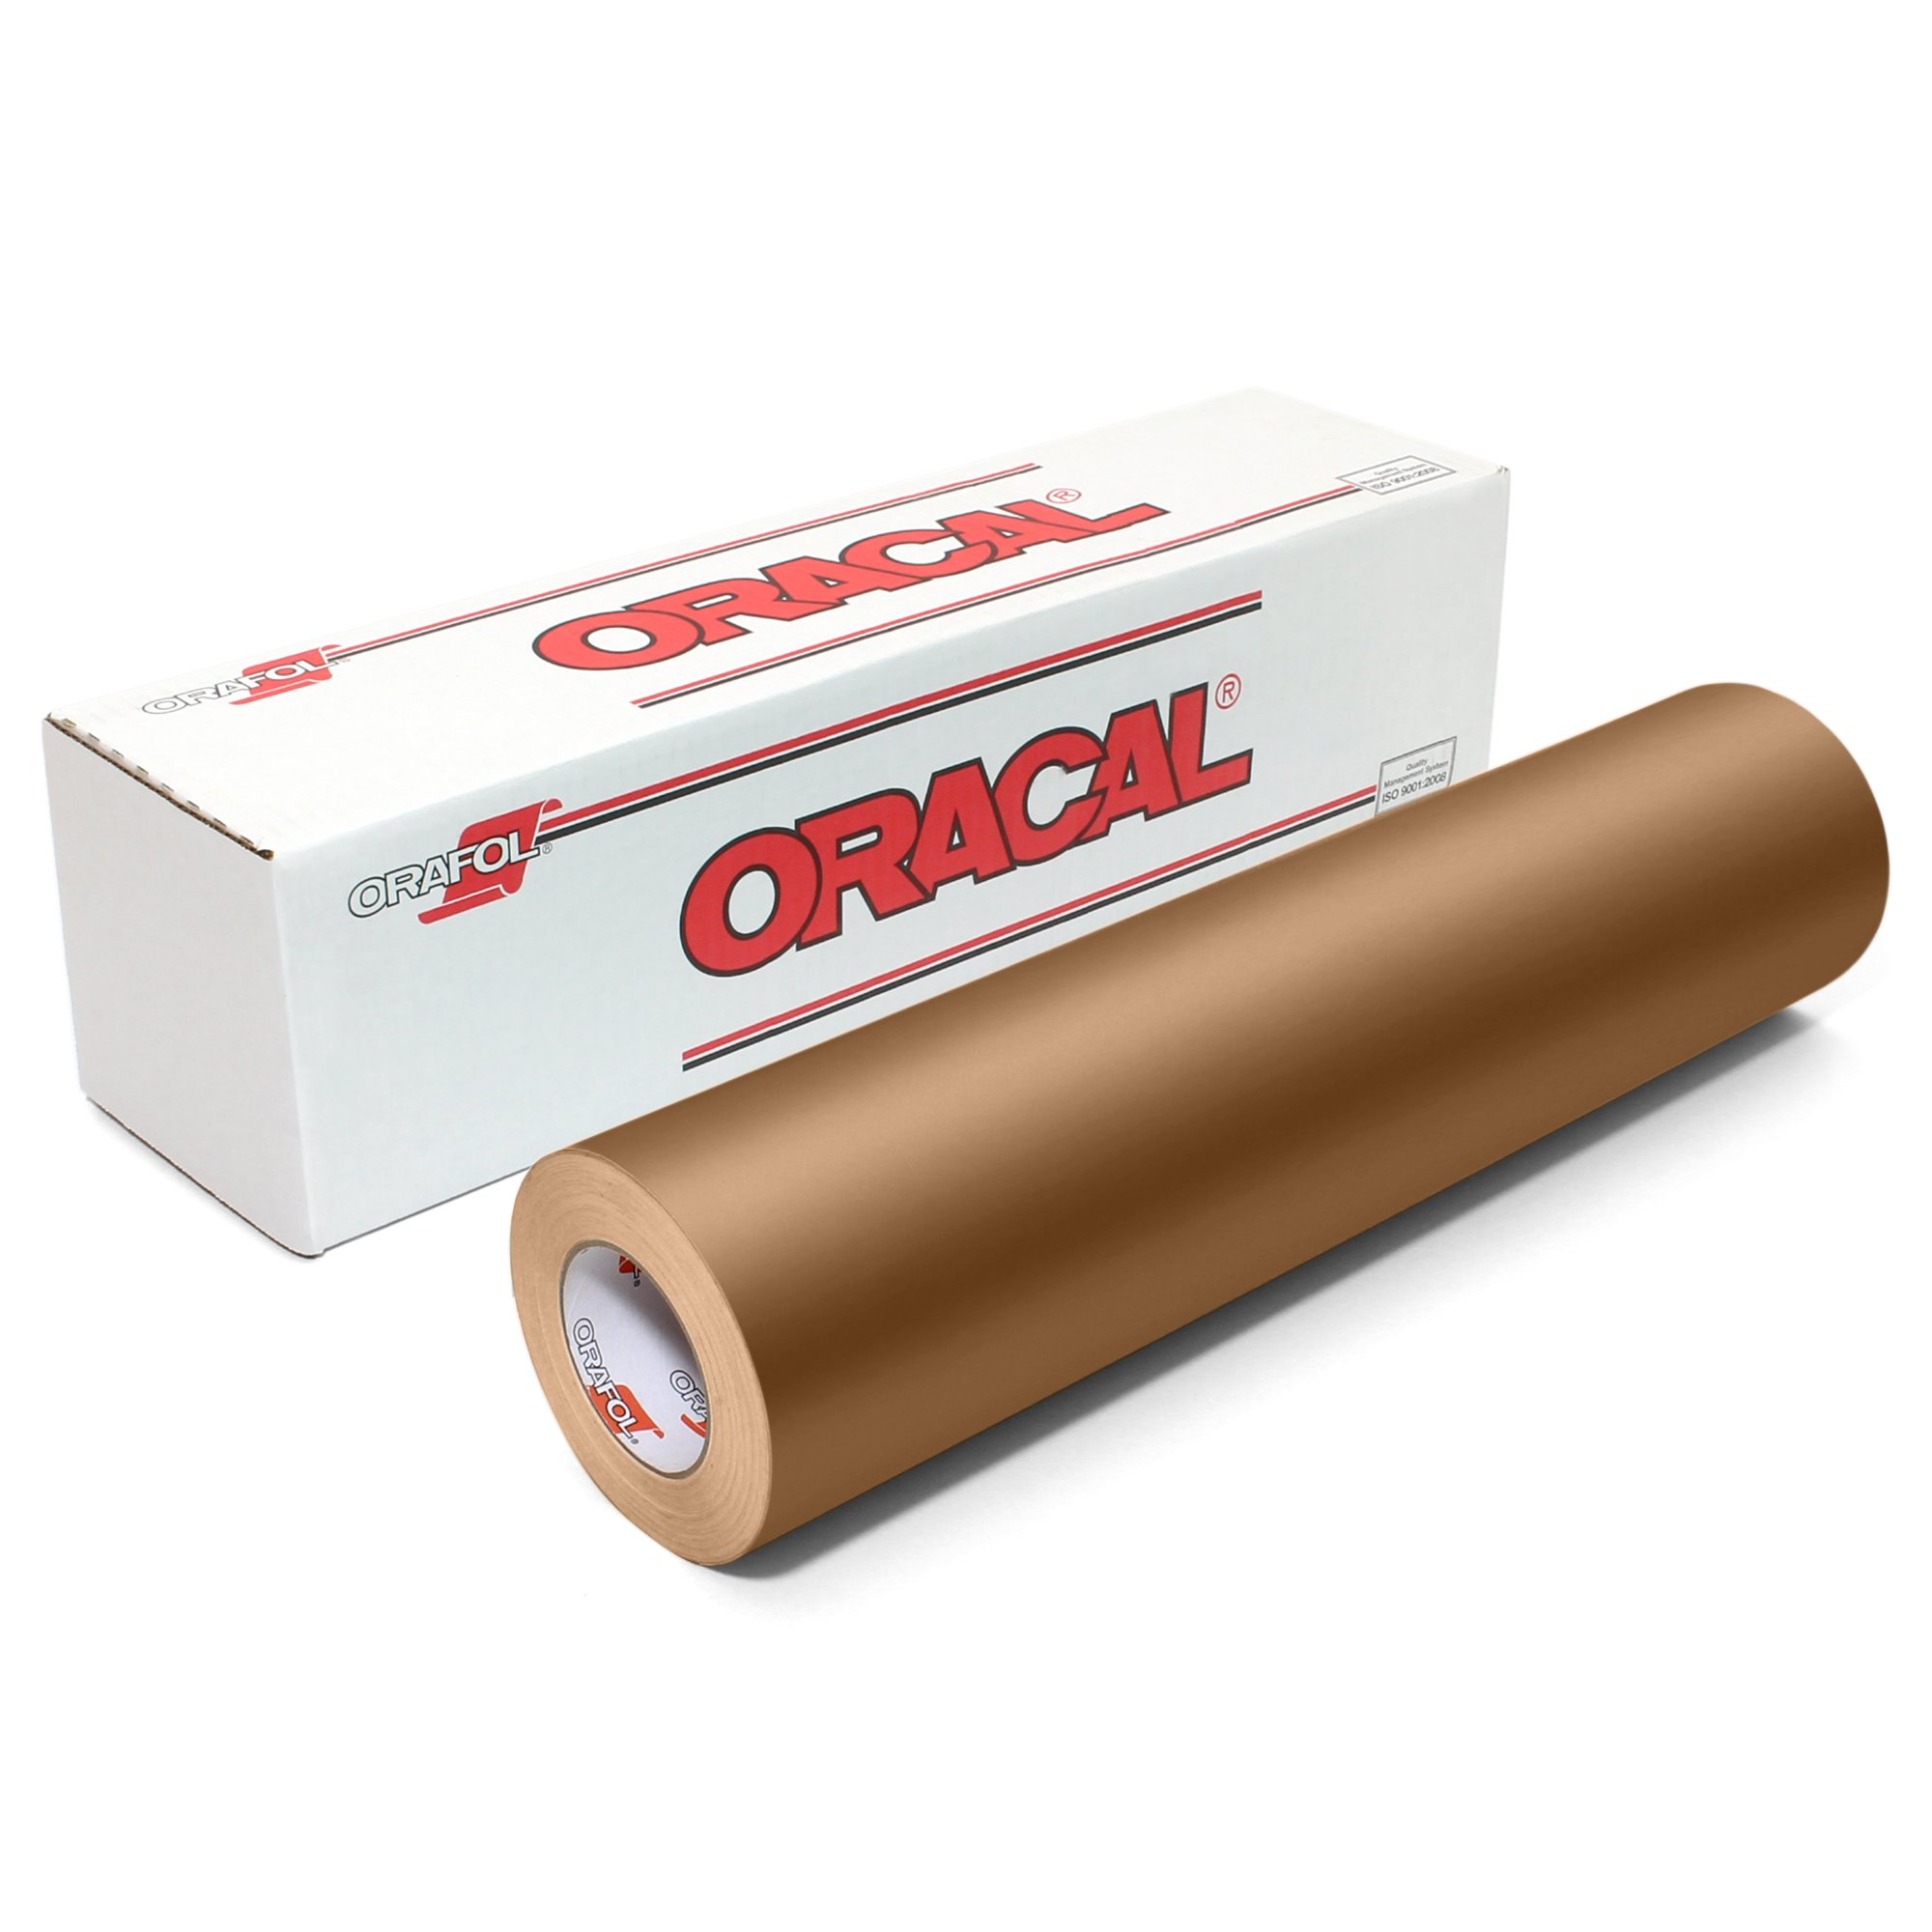 Oracal 631 Matte Vinyl Roll 24 Inches by 150 Feet - Metallic Copper